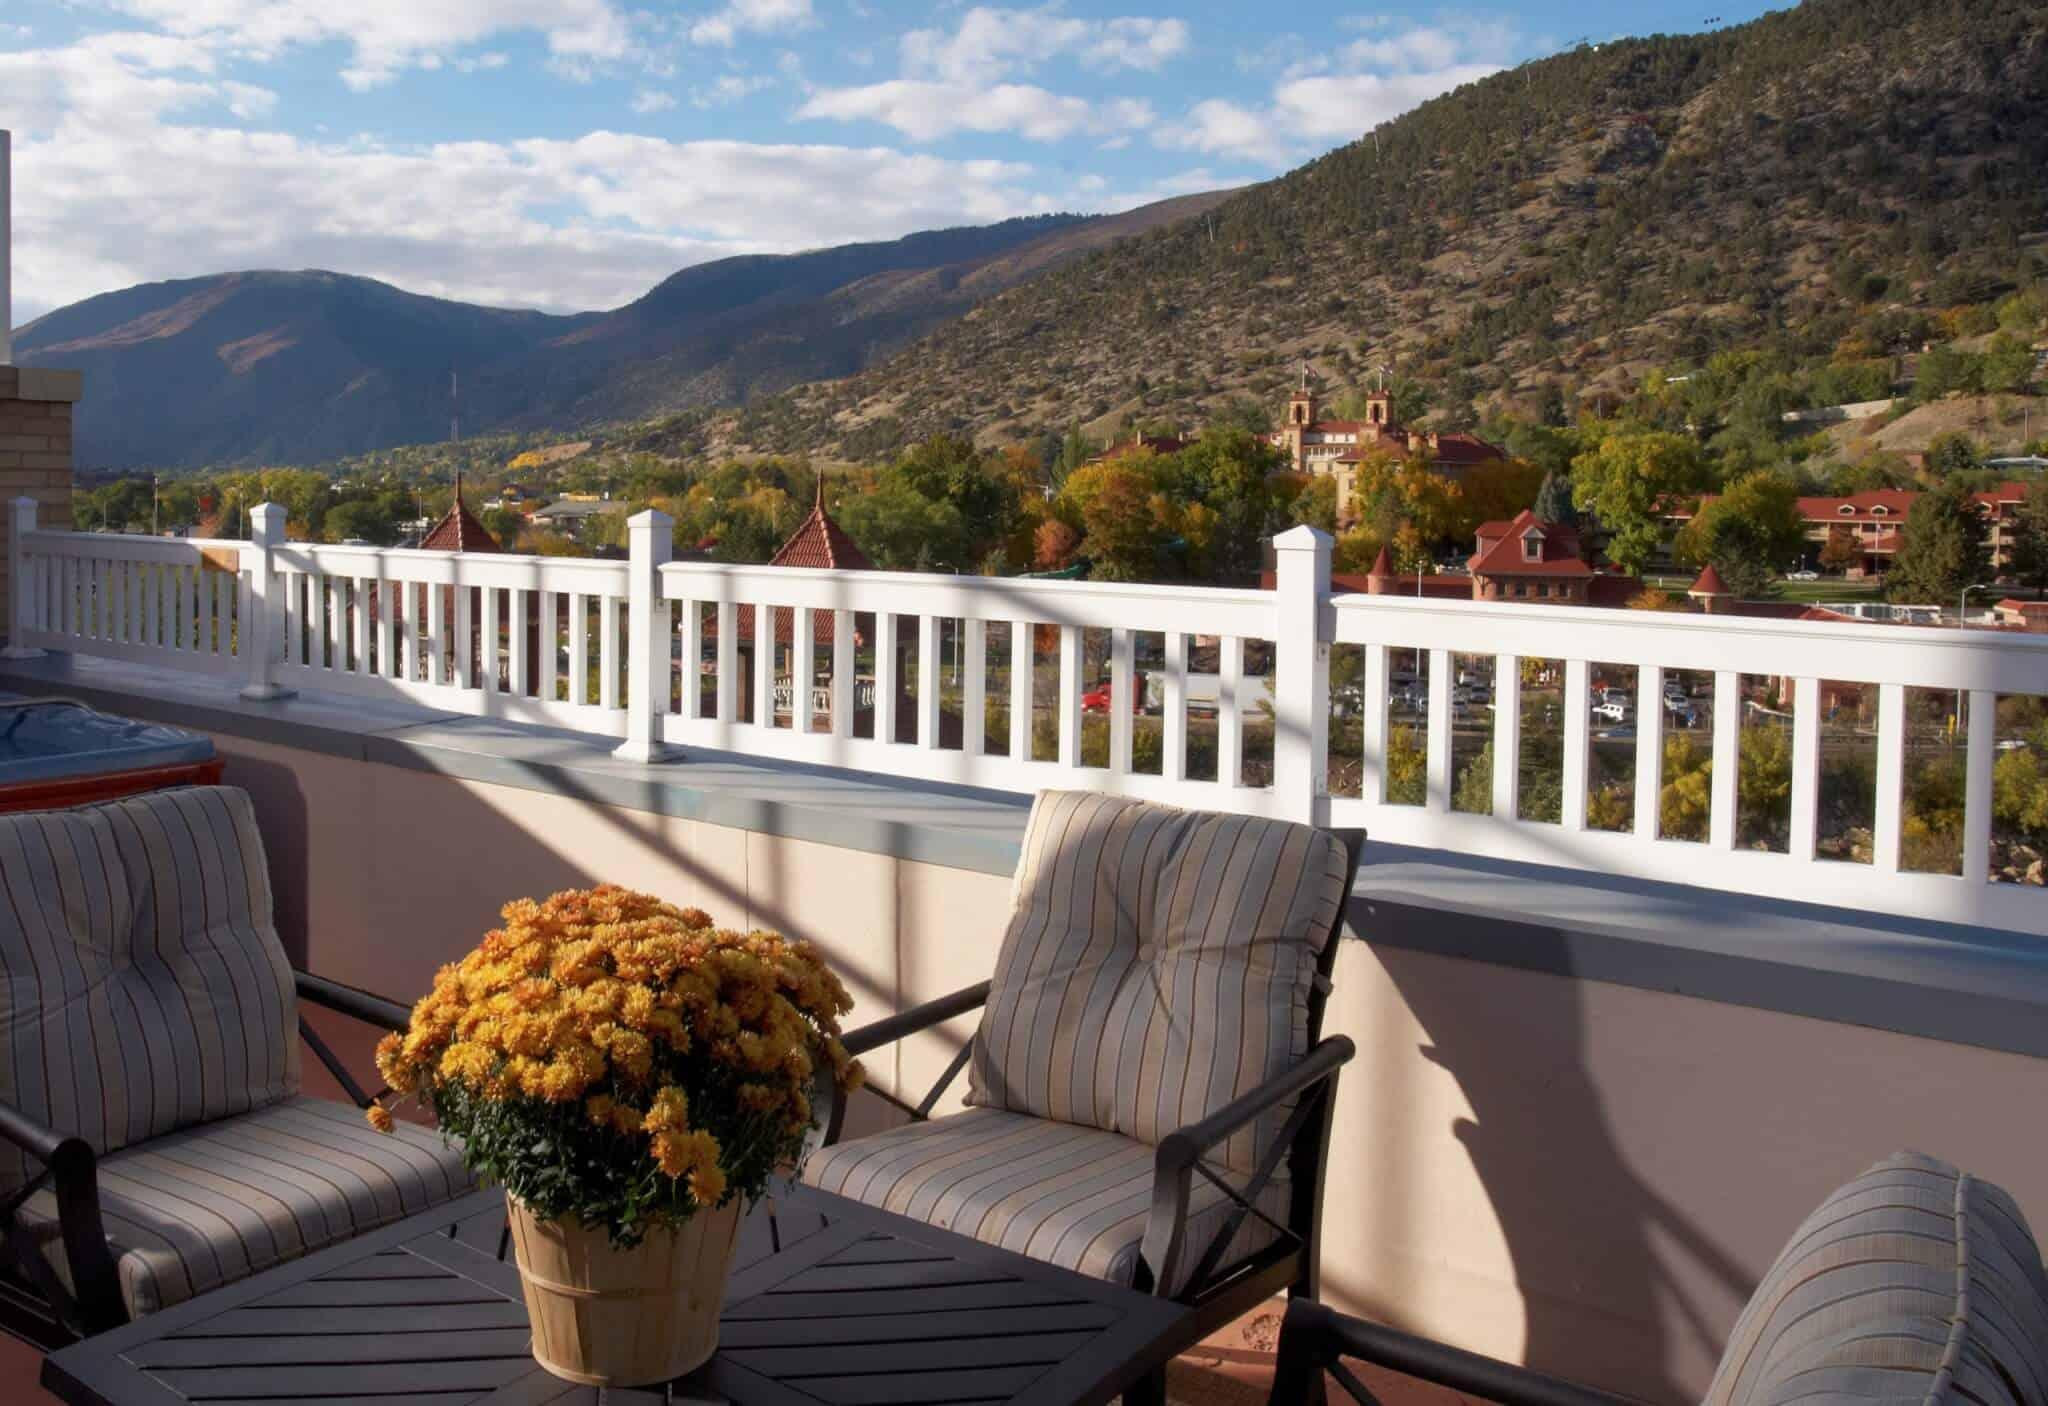 penthouse suite hotel denver glenwood springs colorado